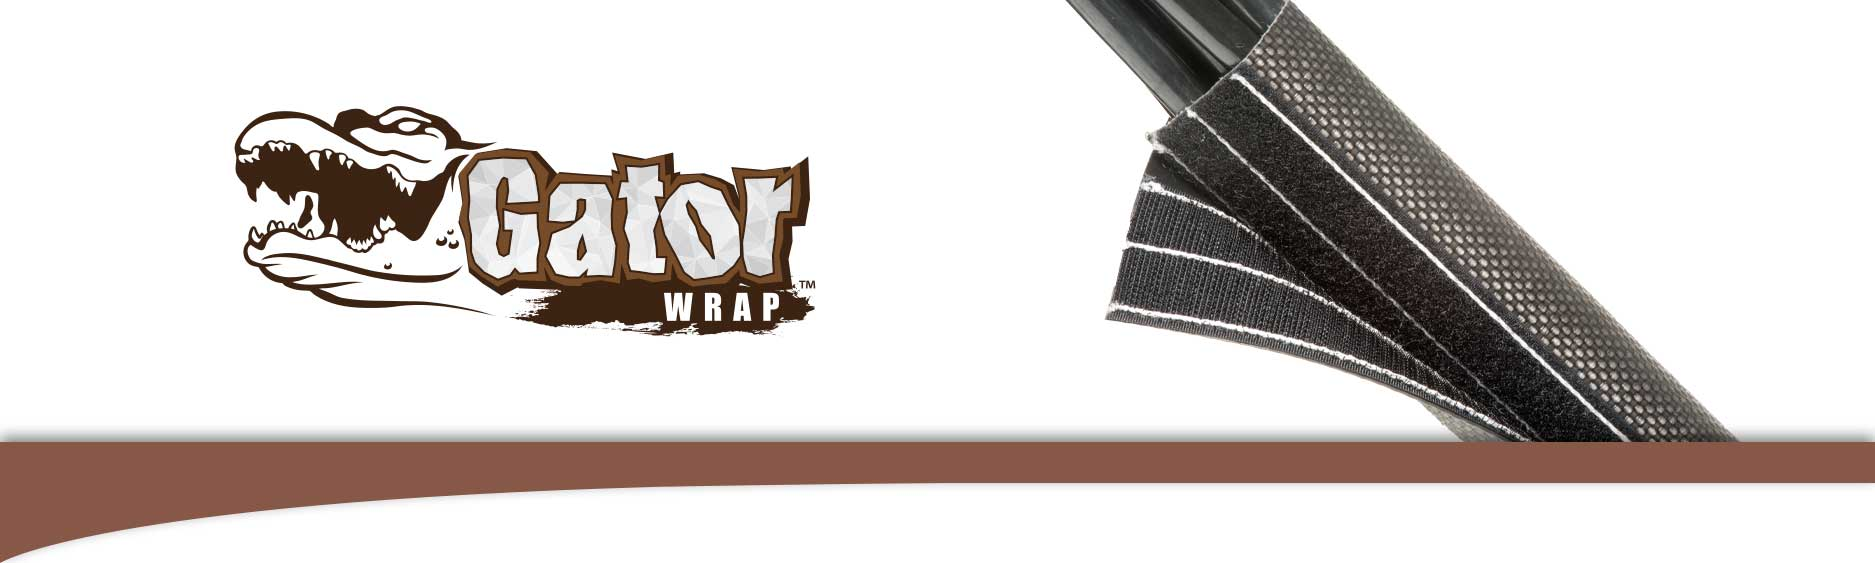 Gator Wrap